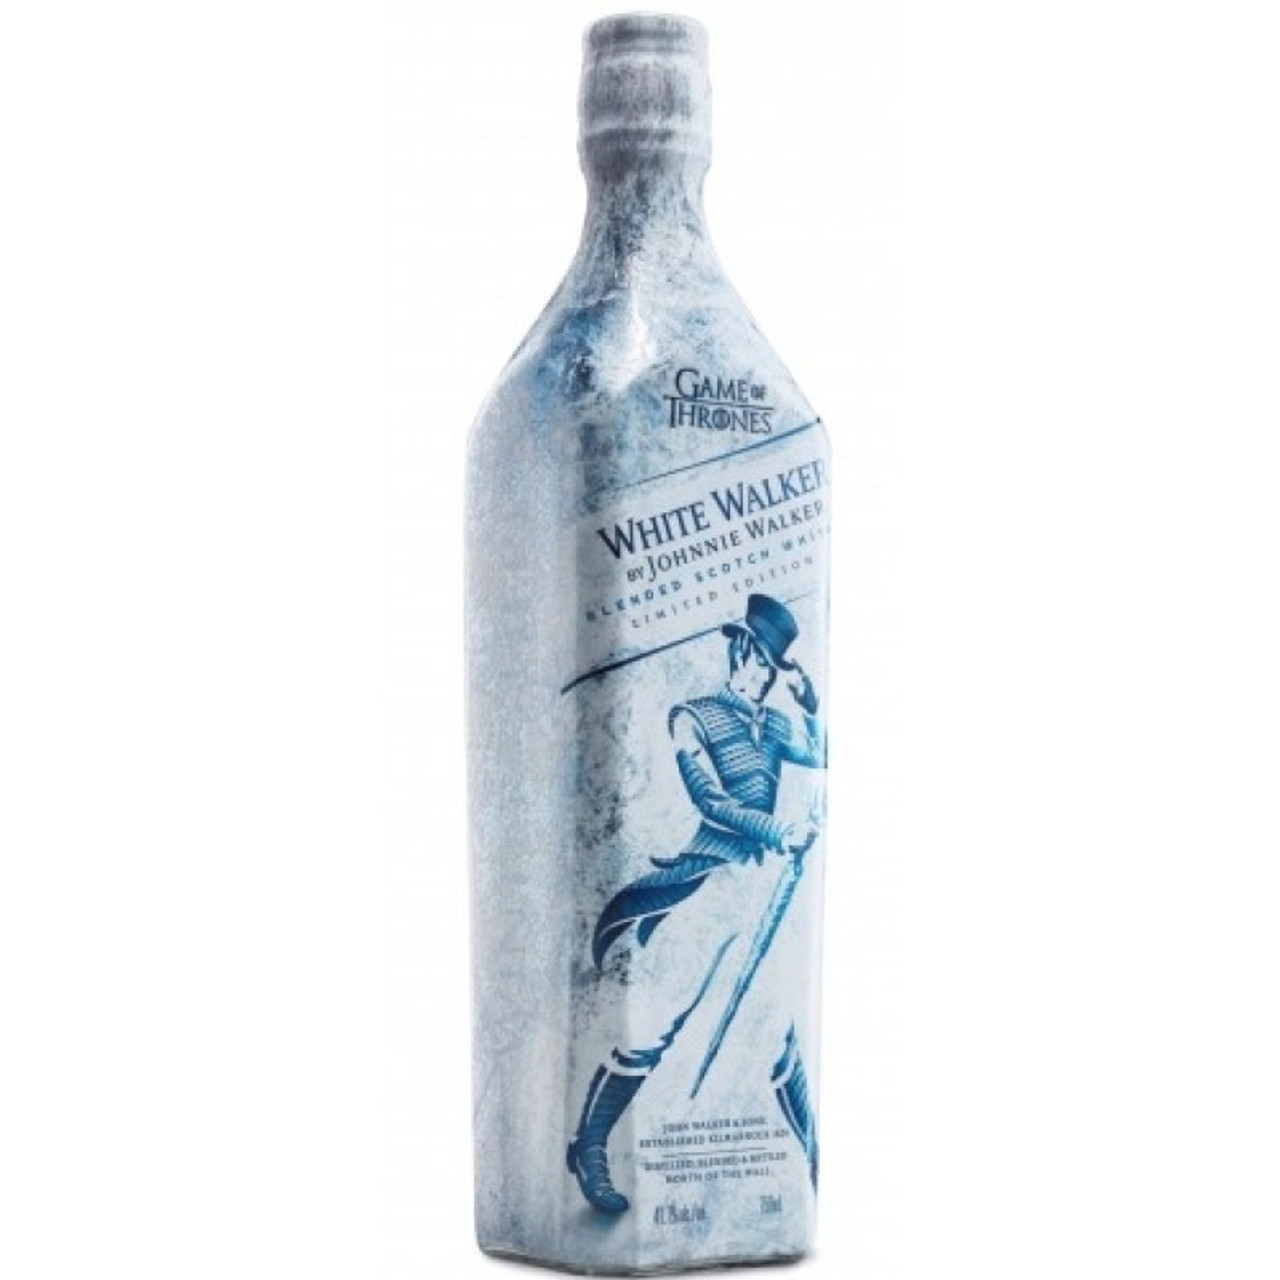 Johnnie Walker White Walker Scotch Blended Game Of Thrones Limited Edition 750ml Glendale Liquor Store